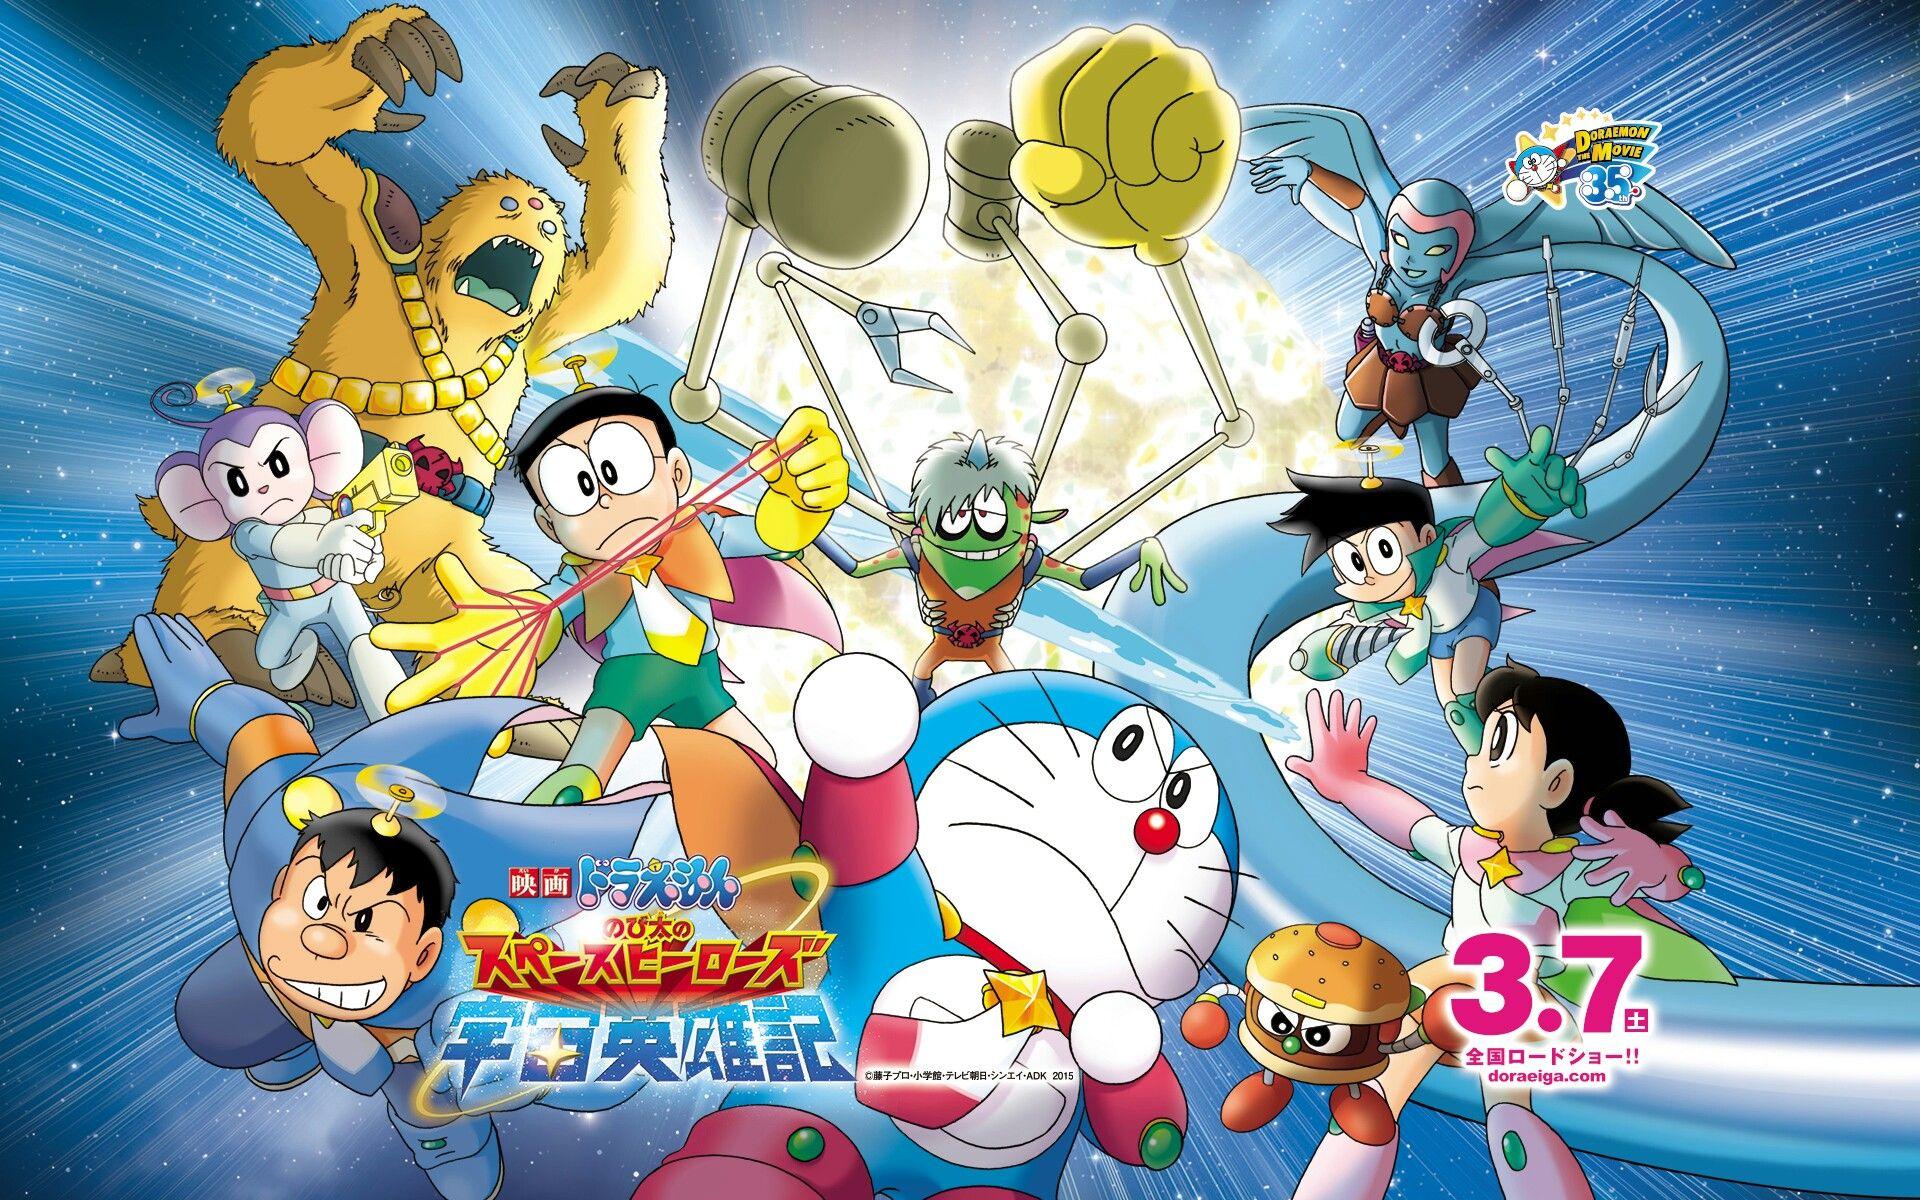 Pin Di Gambar Doraemon Petualangan Nobita Yang Baru 2019